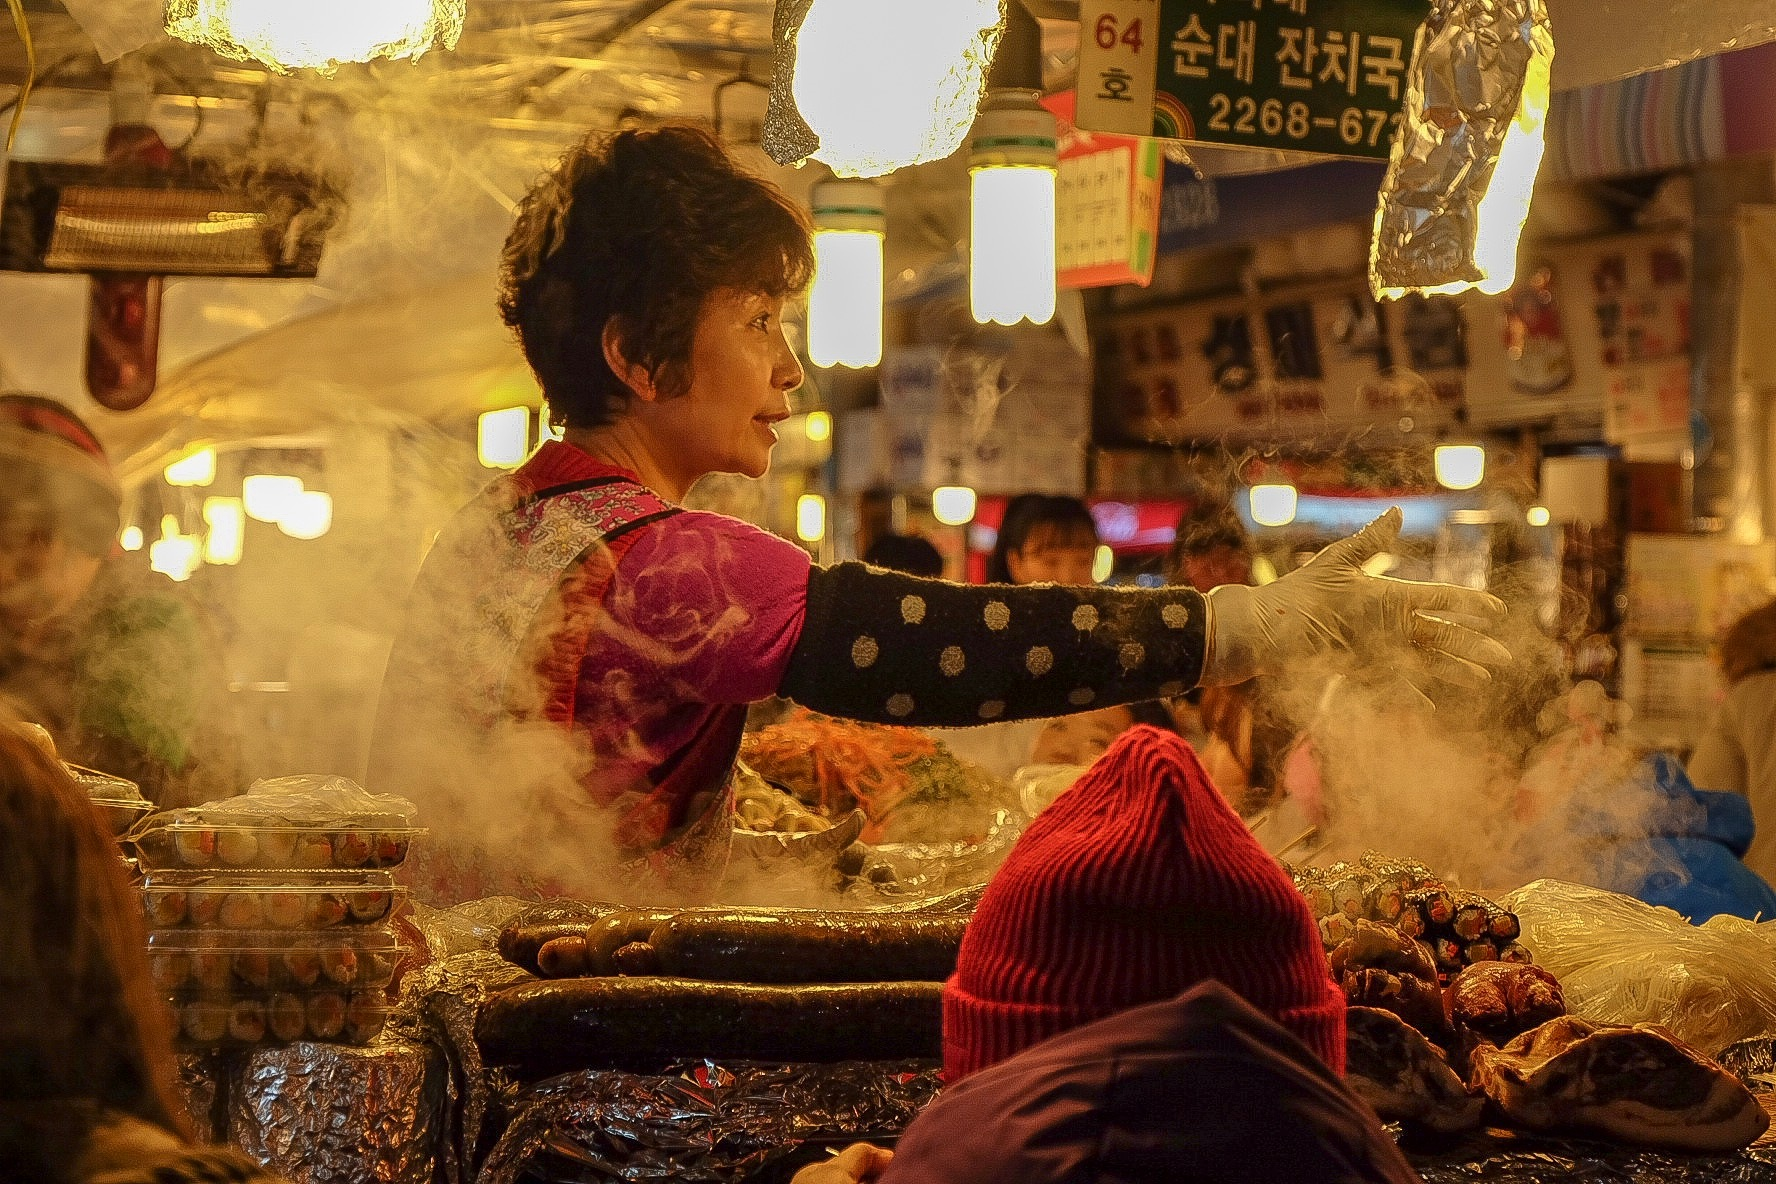 Dinner time at Gwangjang Market by Jake Bo-ot